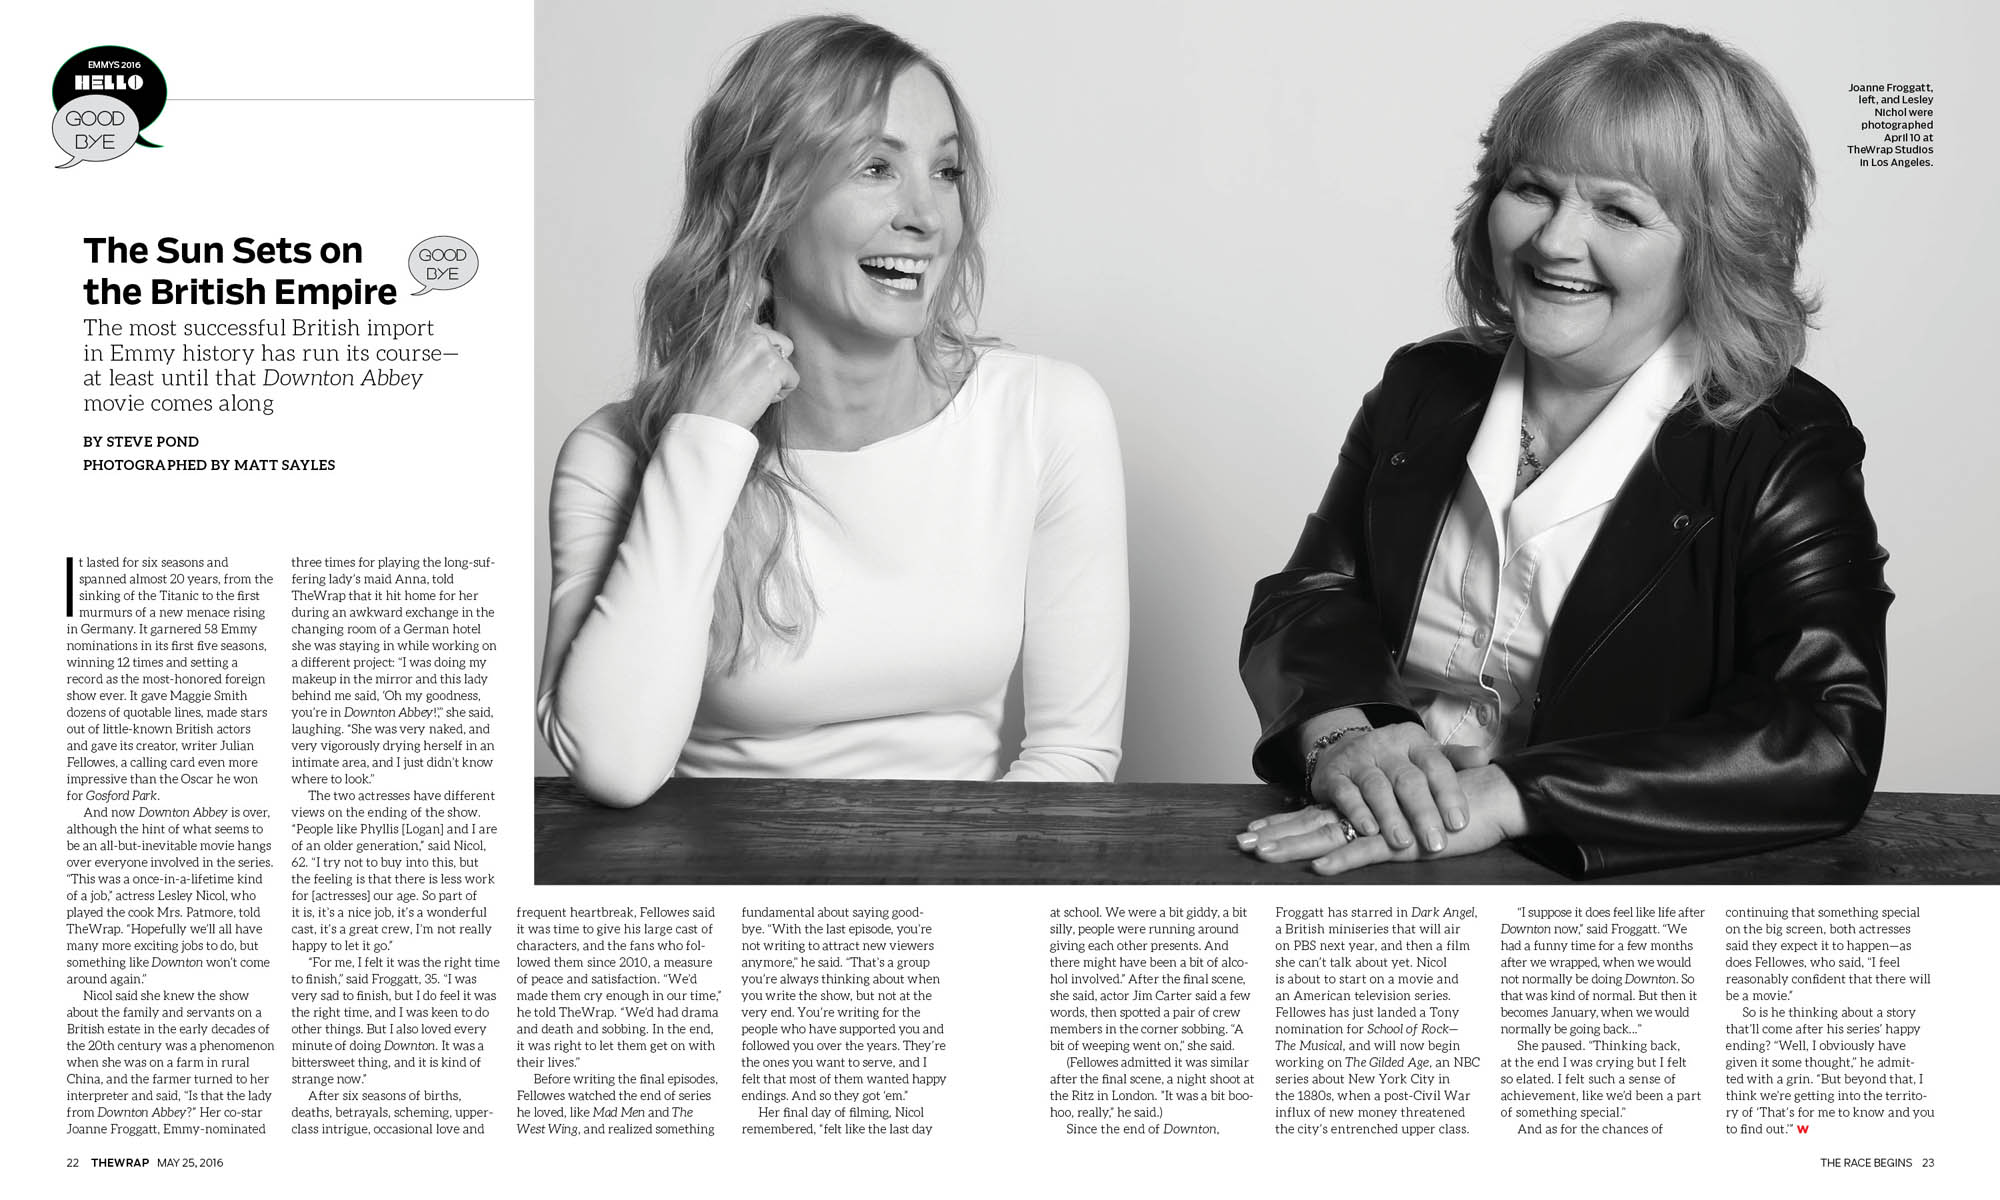 Joanne Froggatt and Lesley Nichol